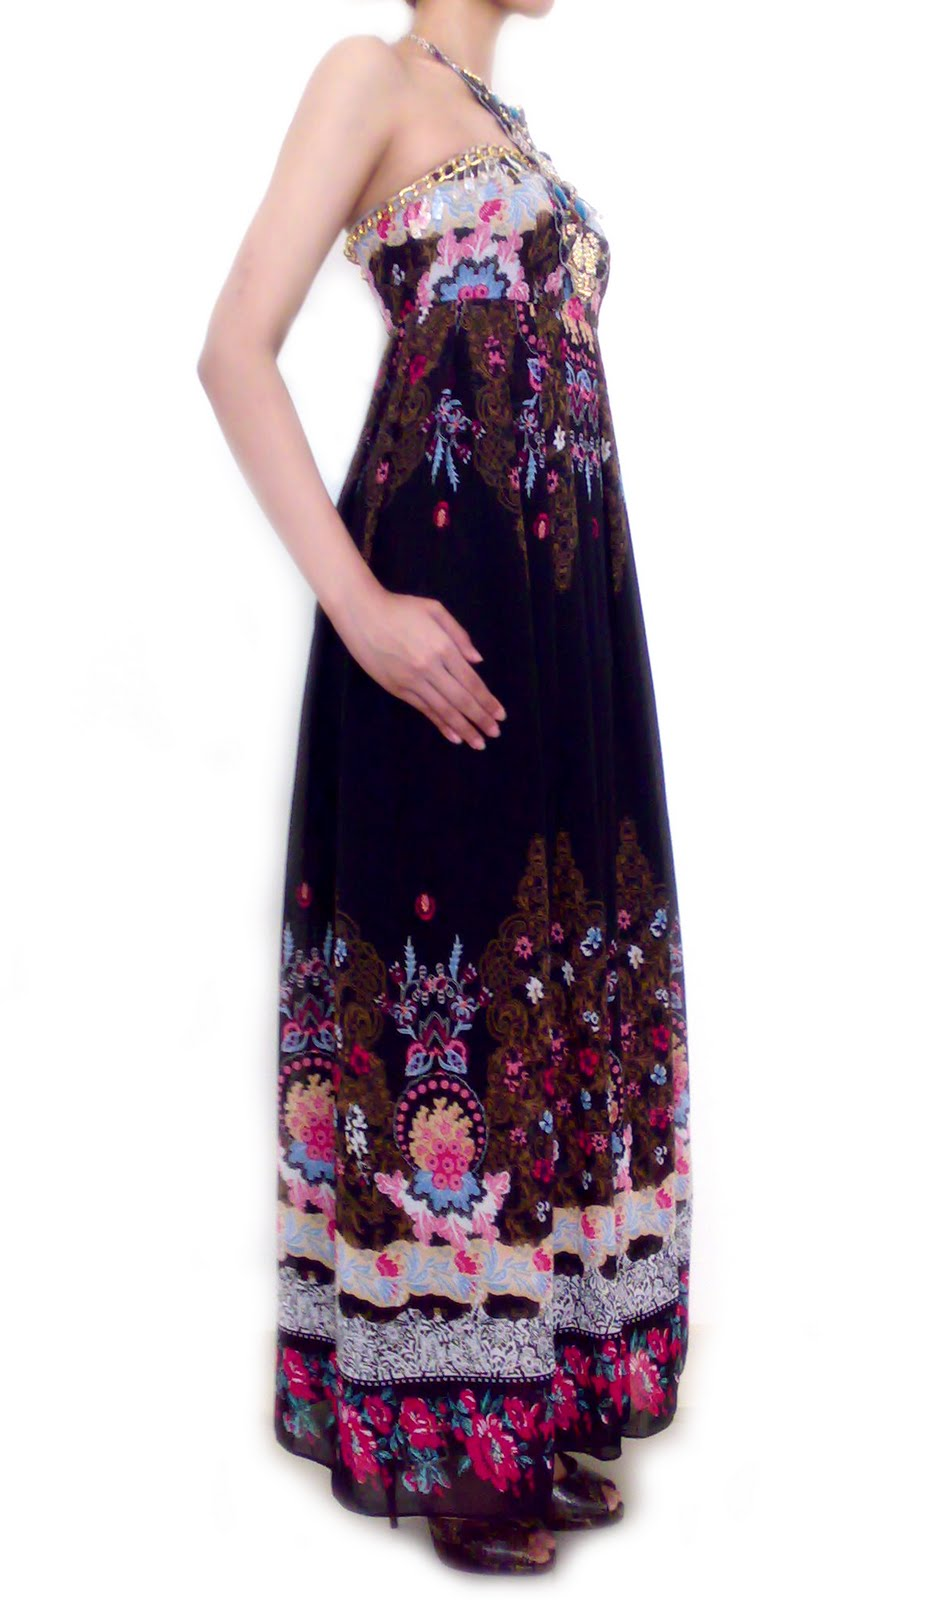 Contoh Gambar Model baju Batik Wanita